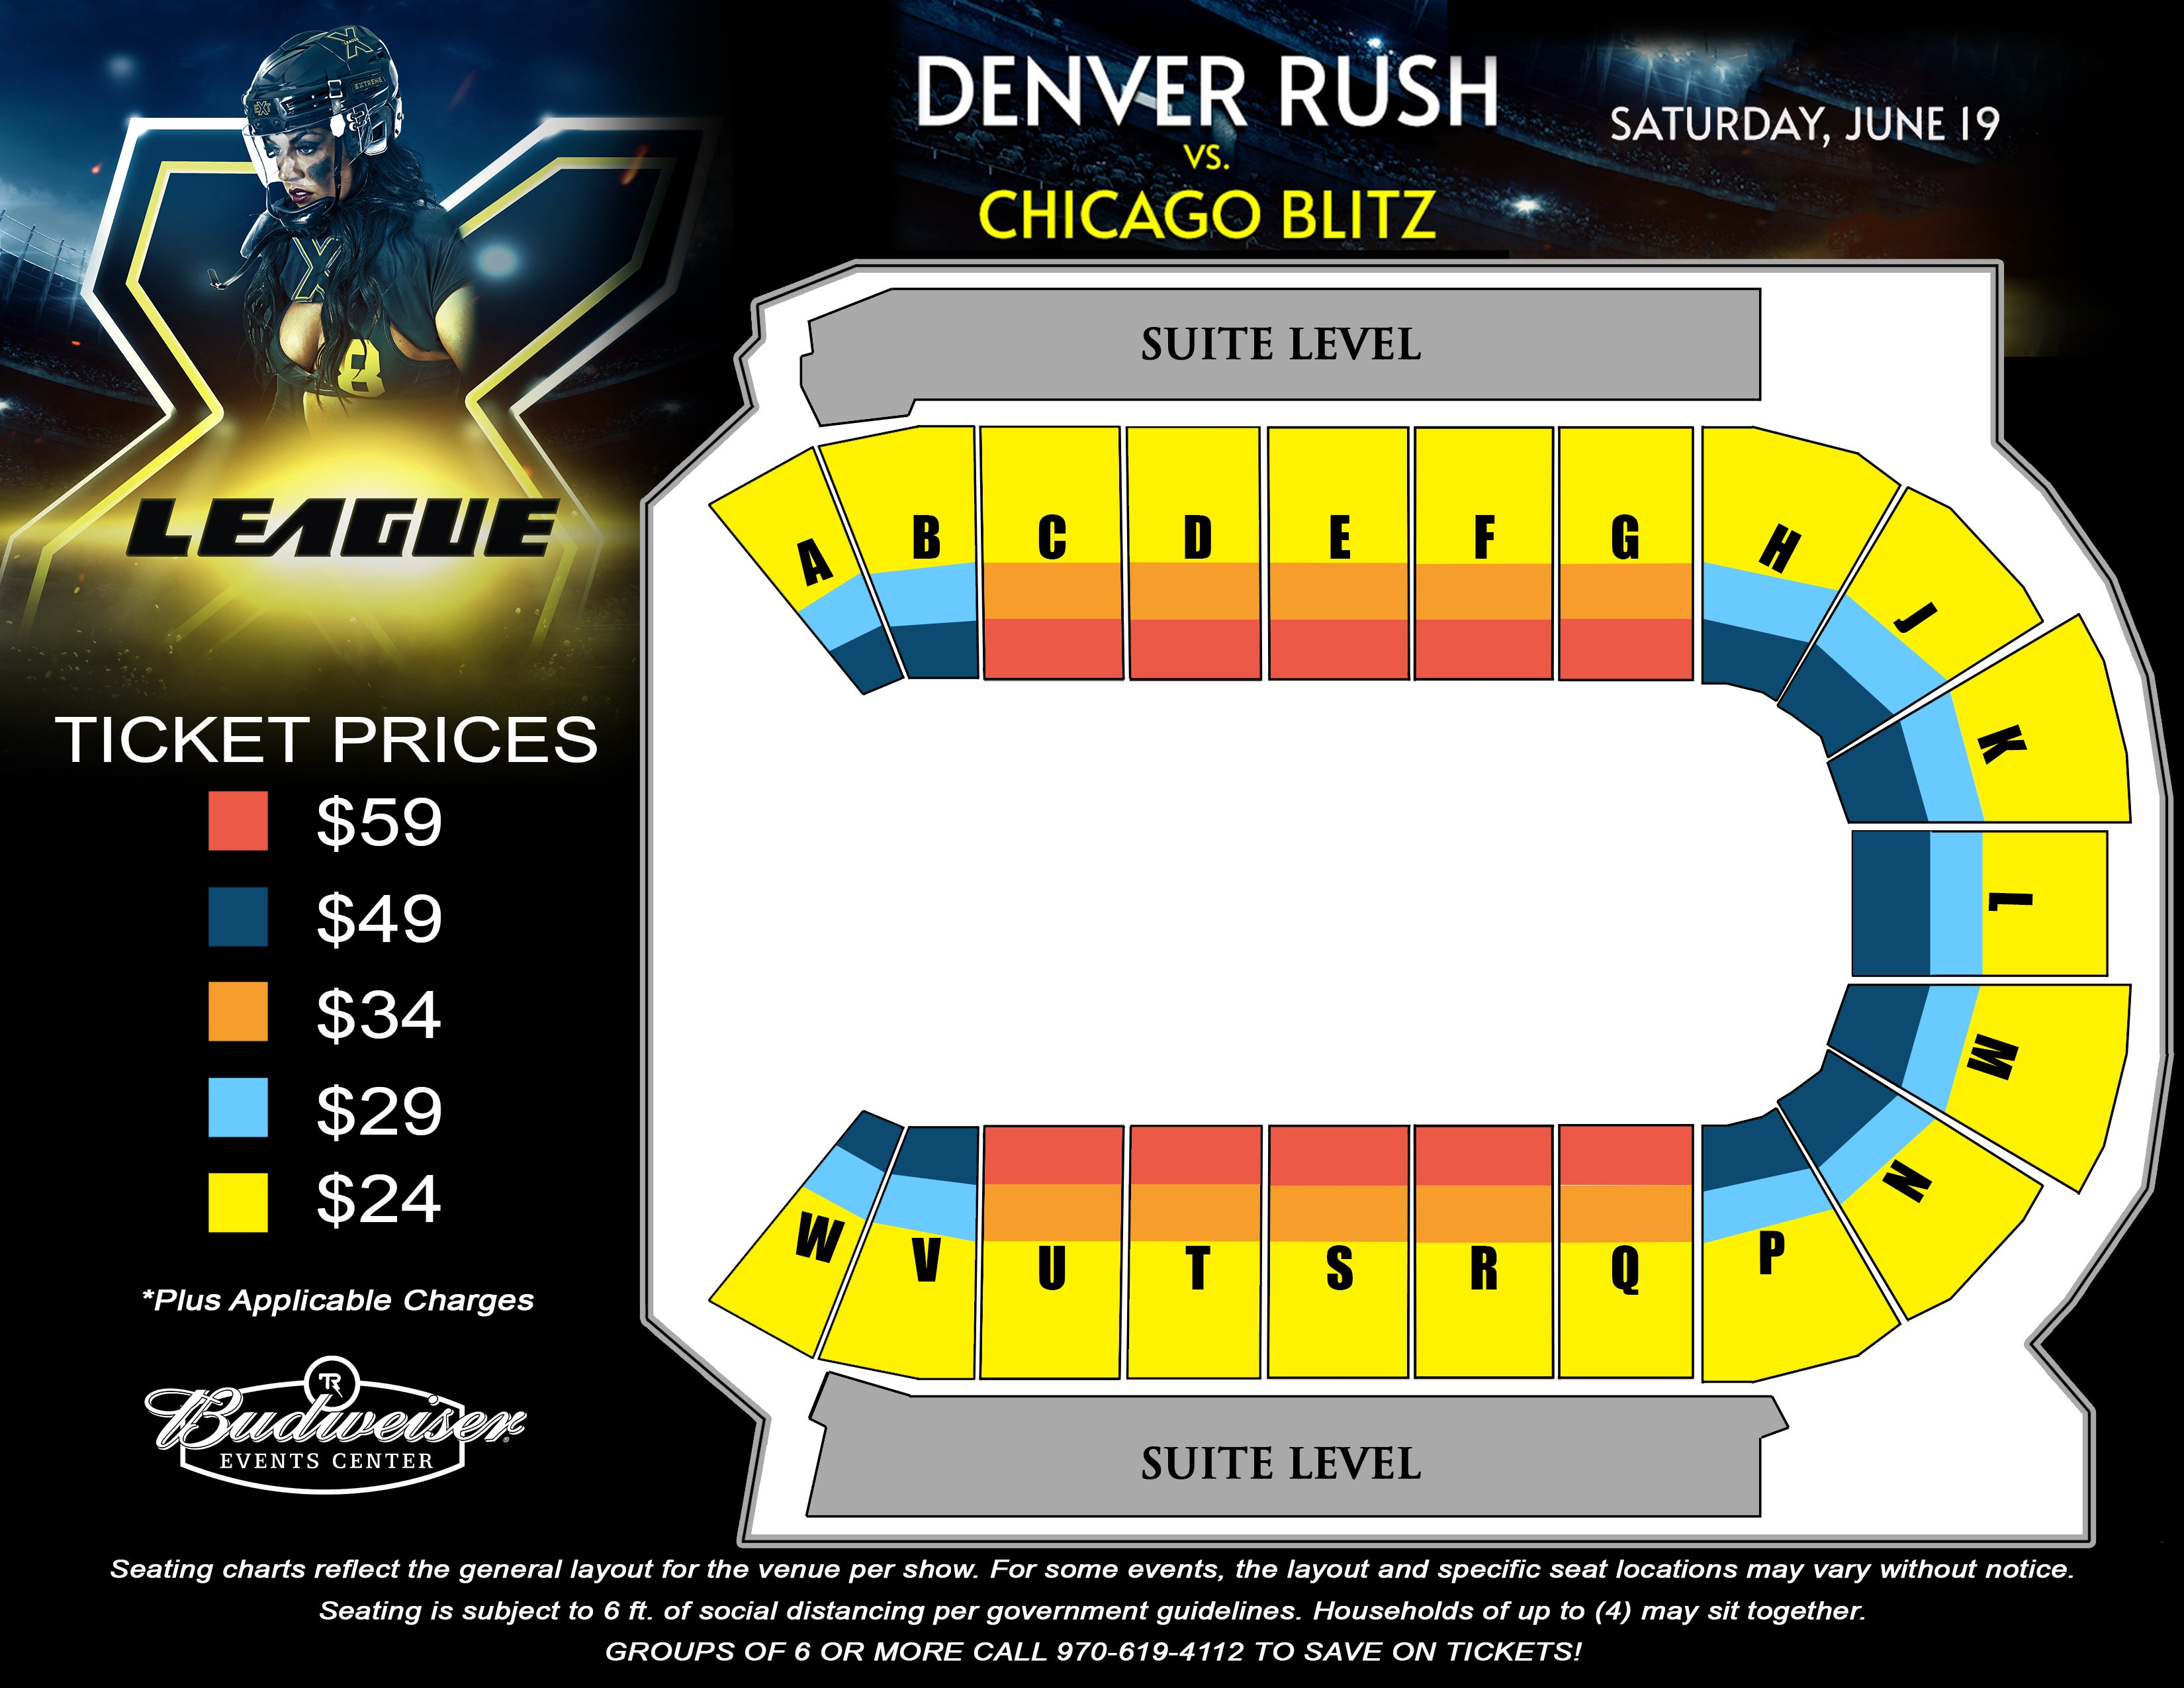 X League: Denver Rush vs. Chicago Blitz